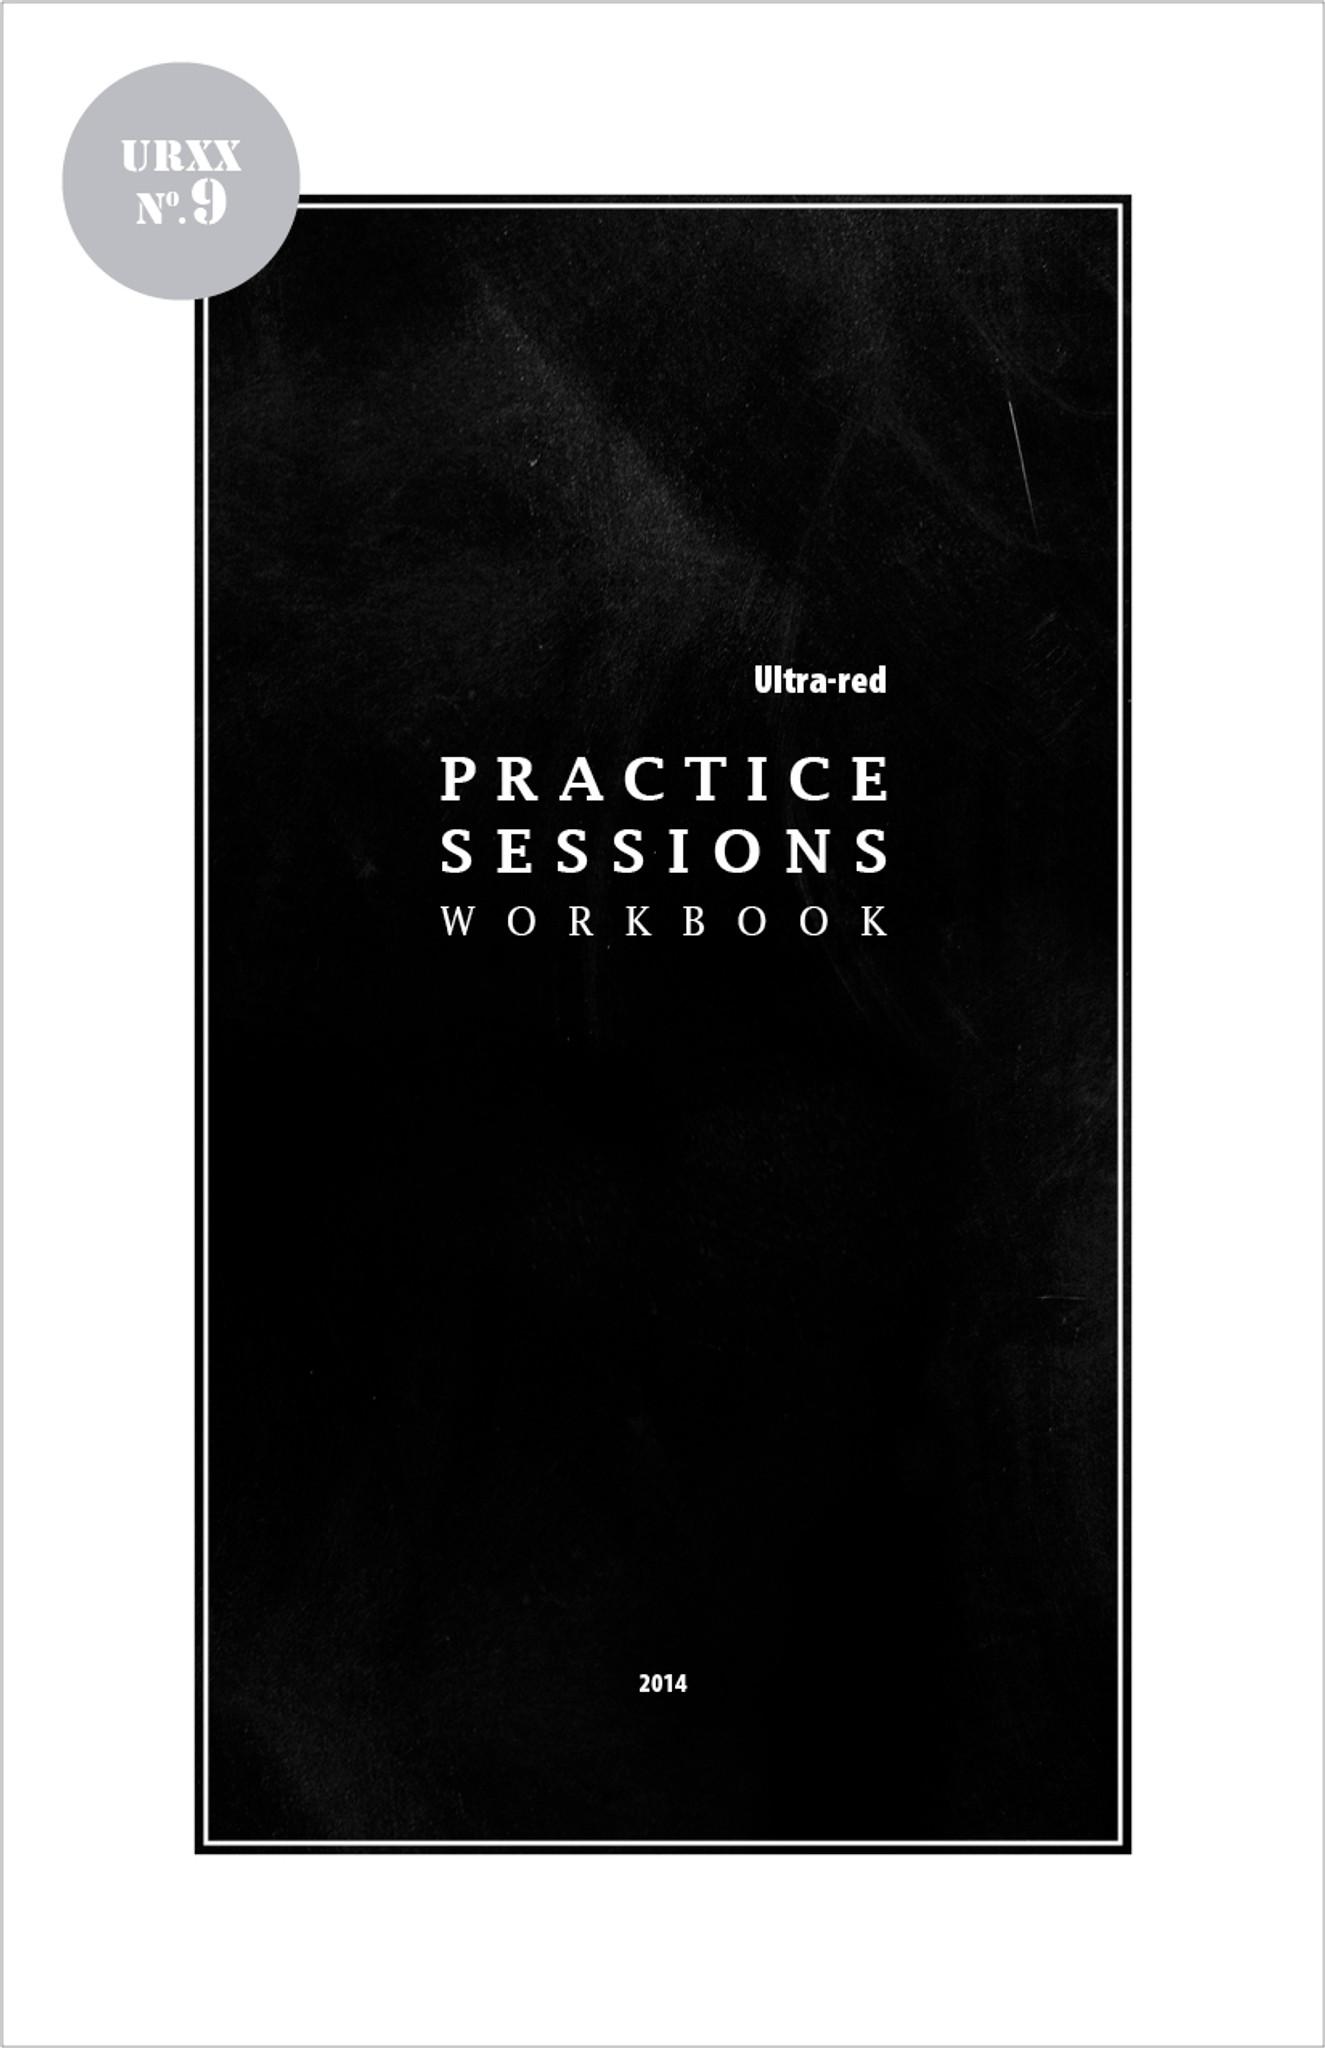 Ultra-Red Workbook 09: Practice Sessions Workbook [PDF-5] - Half